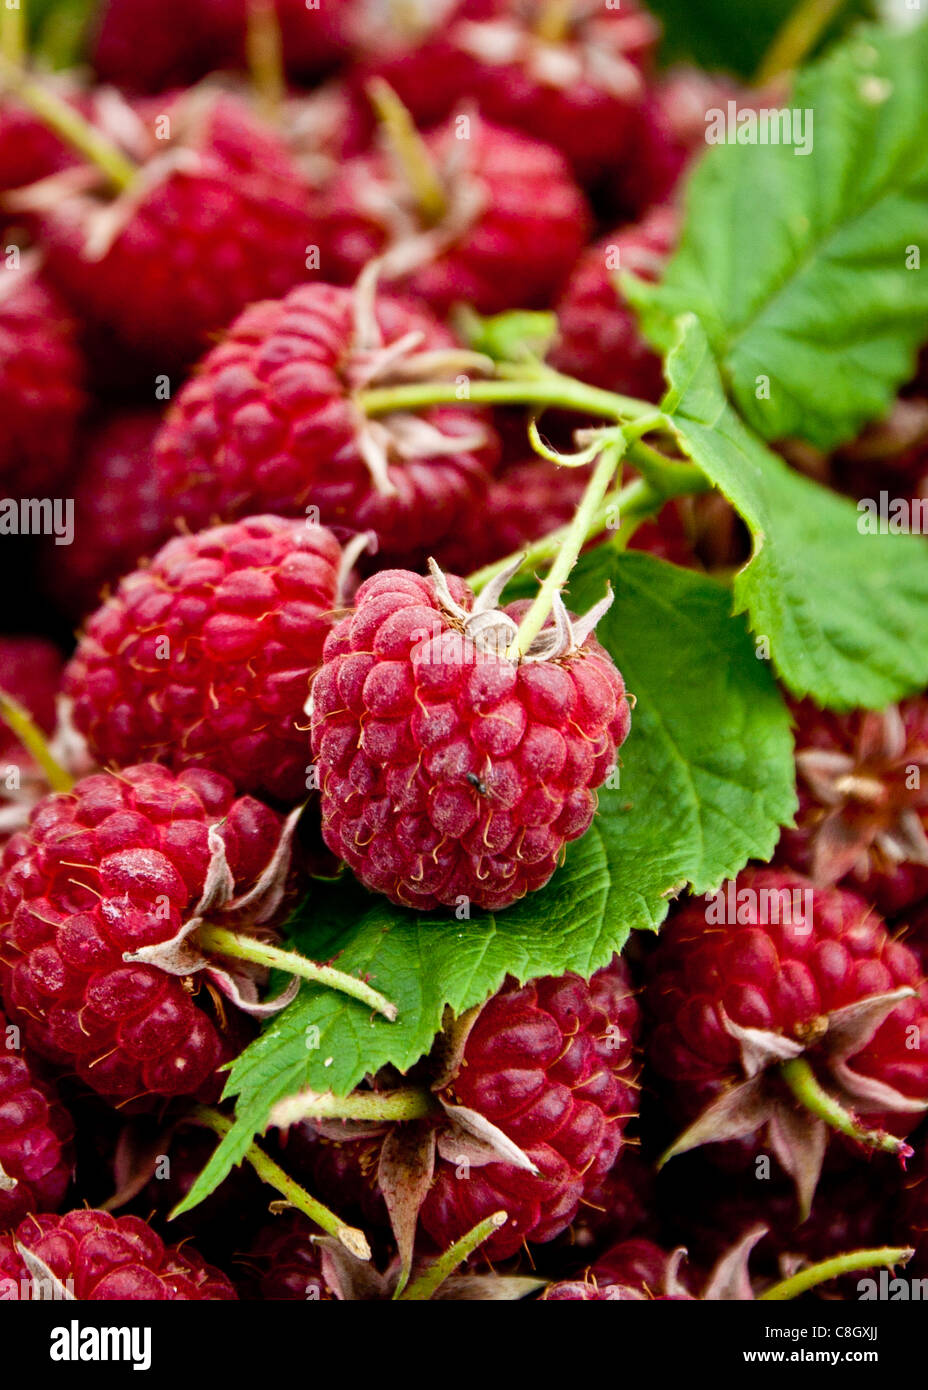 home grown English raspberry - Stock Image